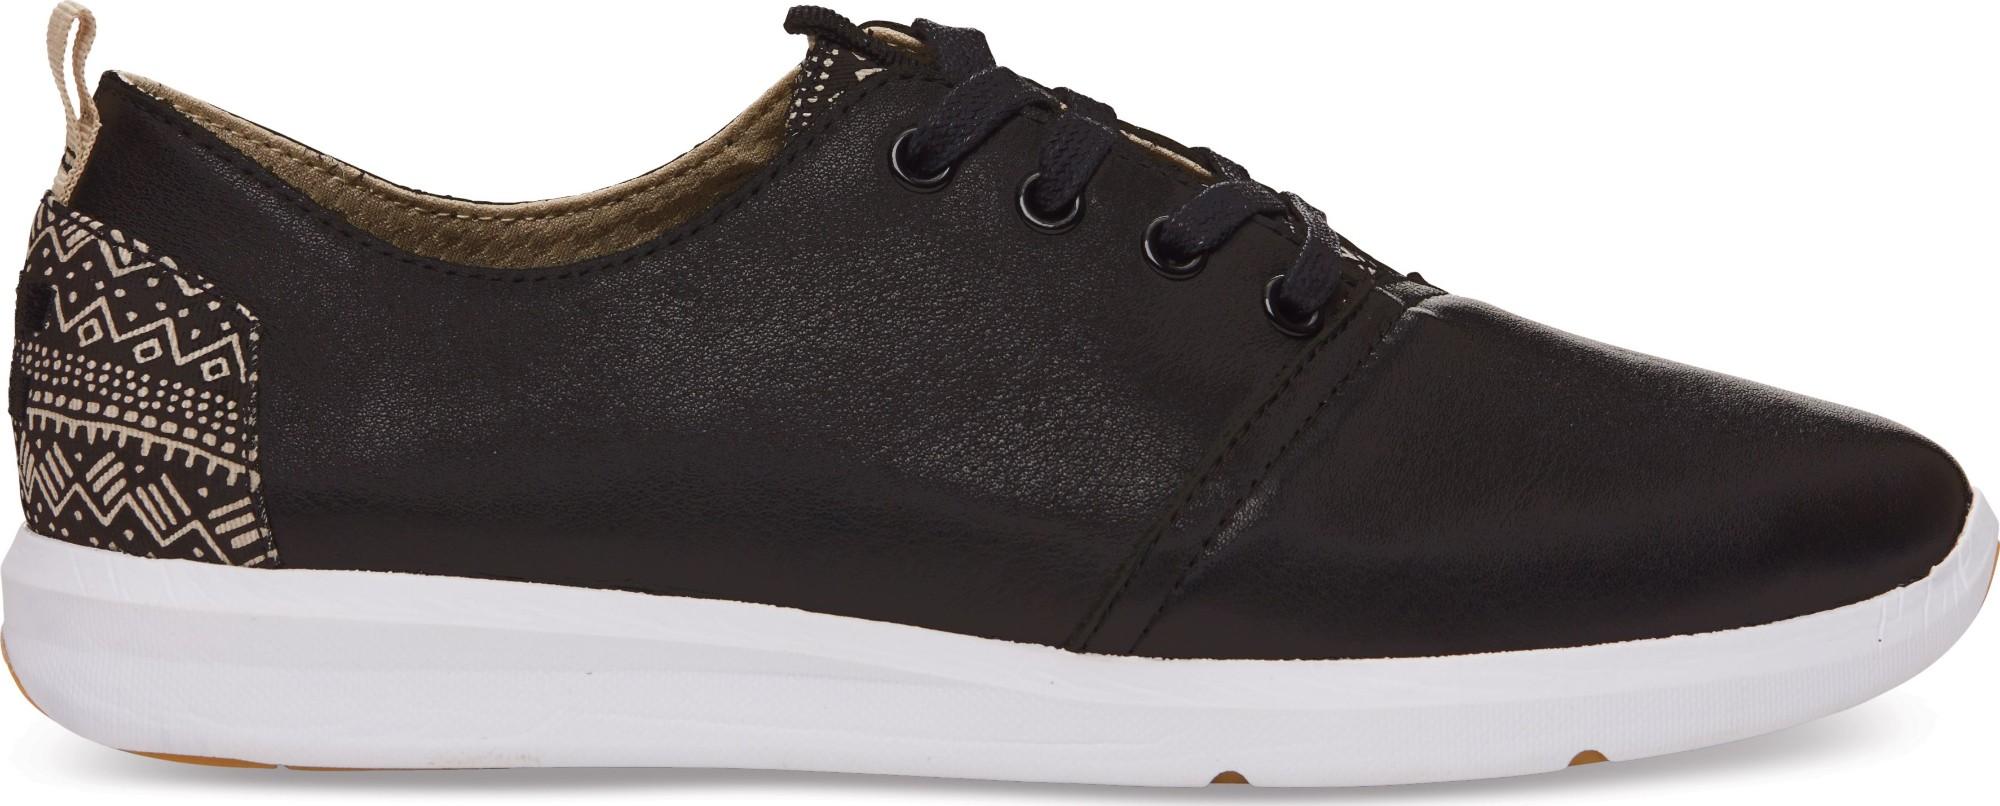 TOMS Suede Men's Viaje Sneaker Black 44